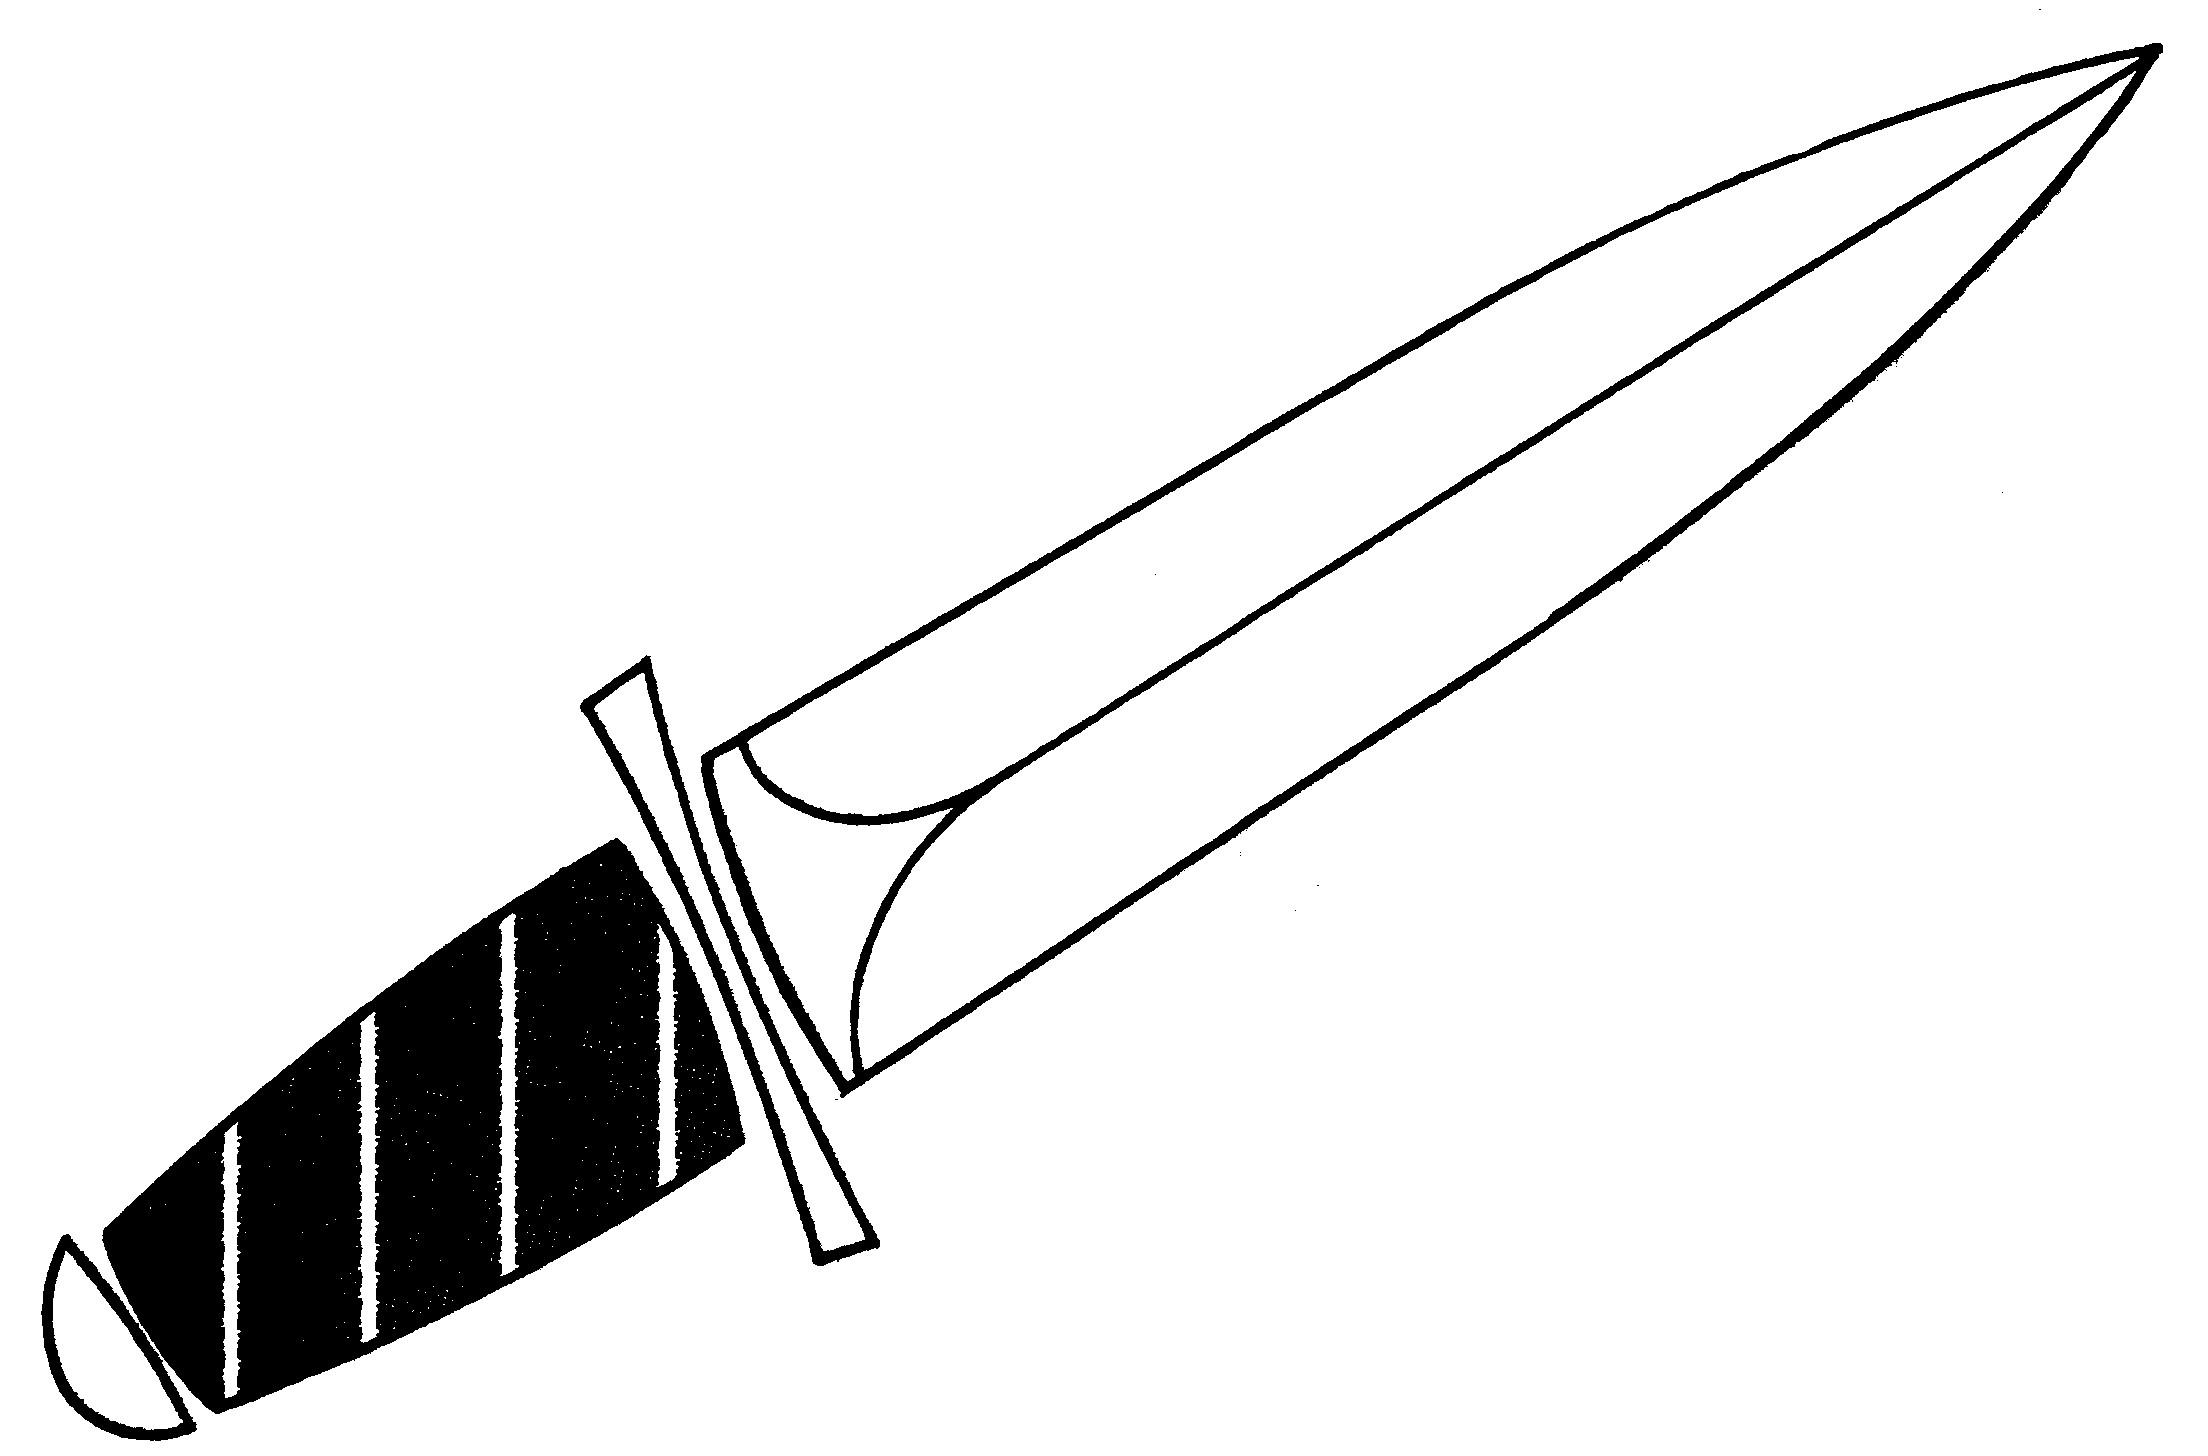 Clip Art Sword & Clip Art Sword Clip Art Images.